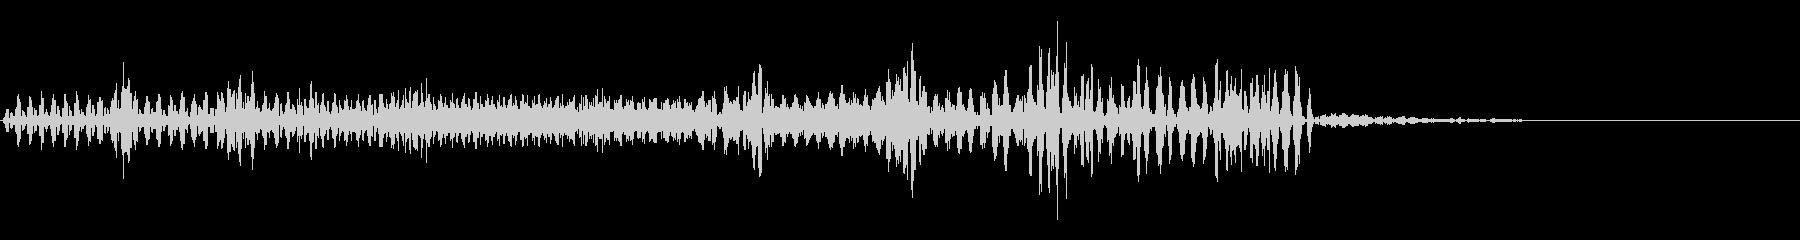 【SE 効果音】不気味な音の未再生の波形